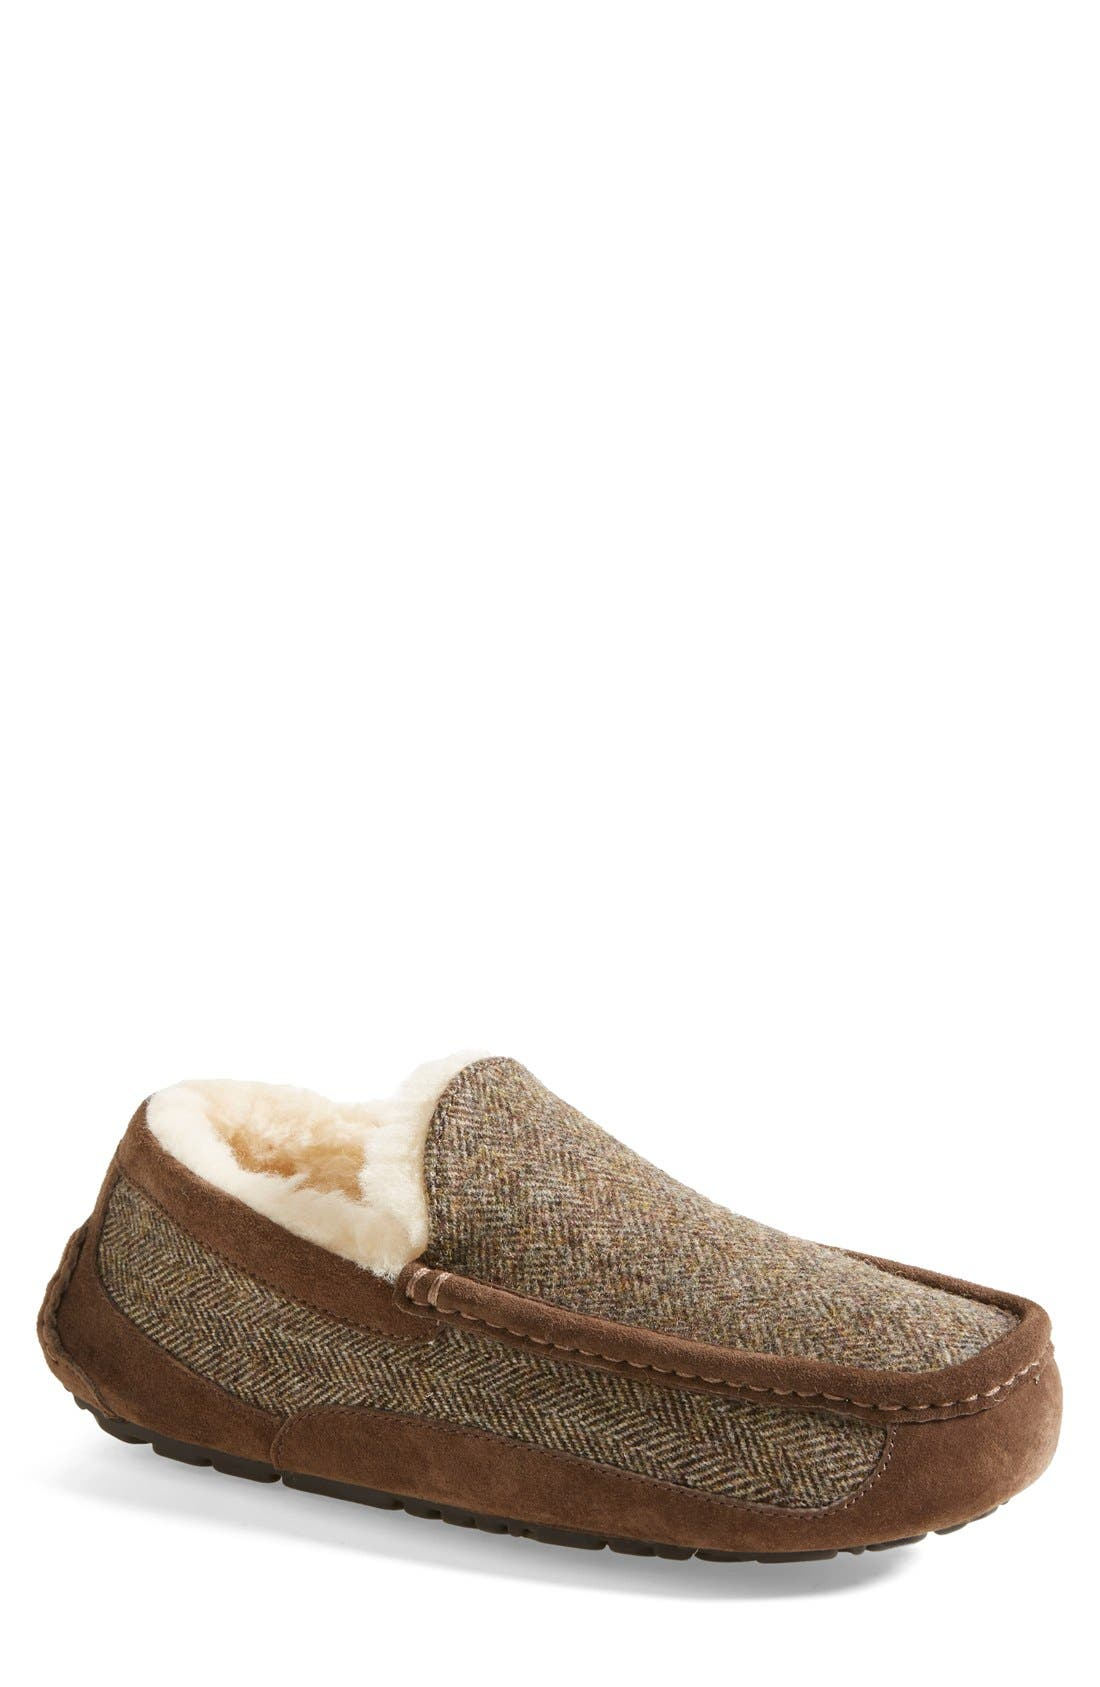 Ascot Tweed Slipper,                         Main,                         color, Stout Tweed